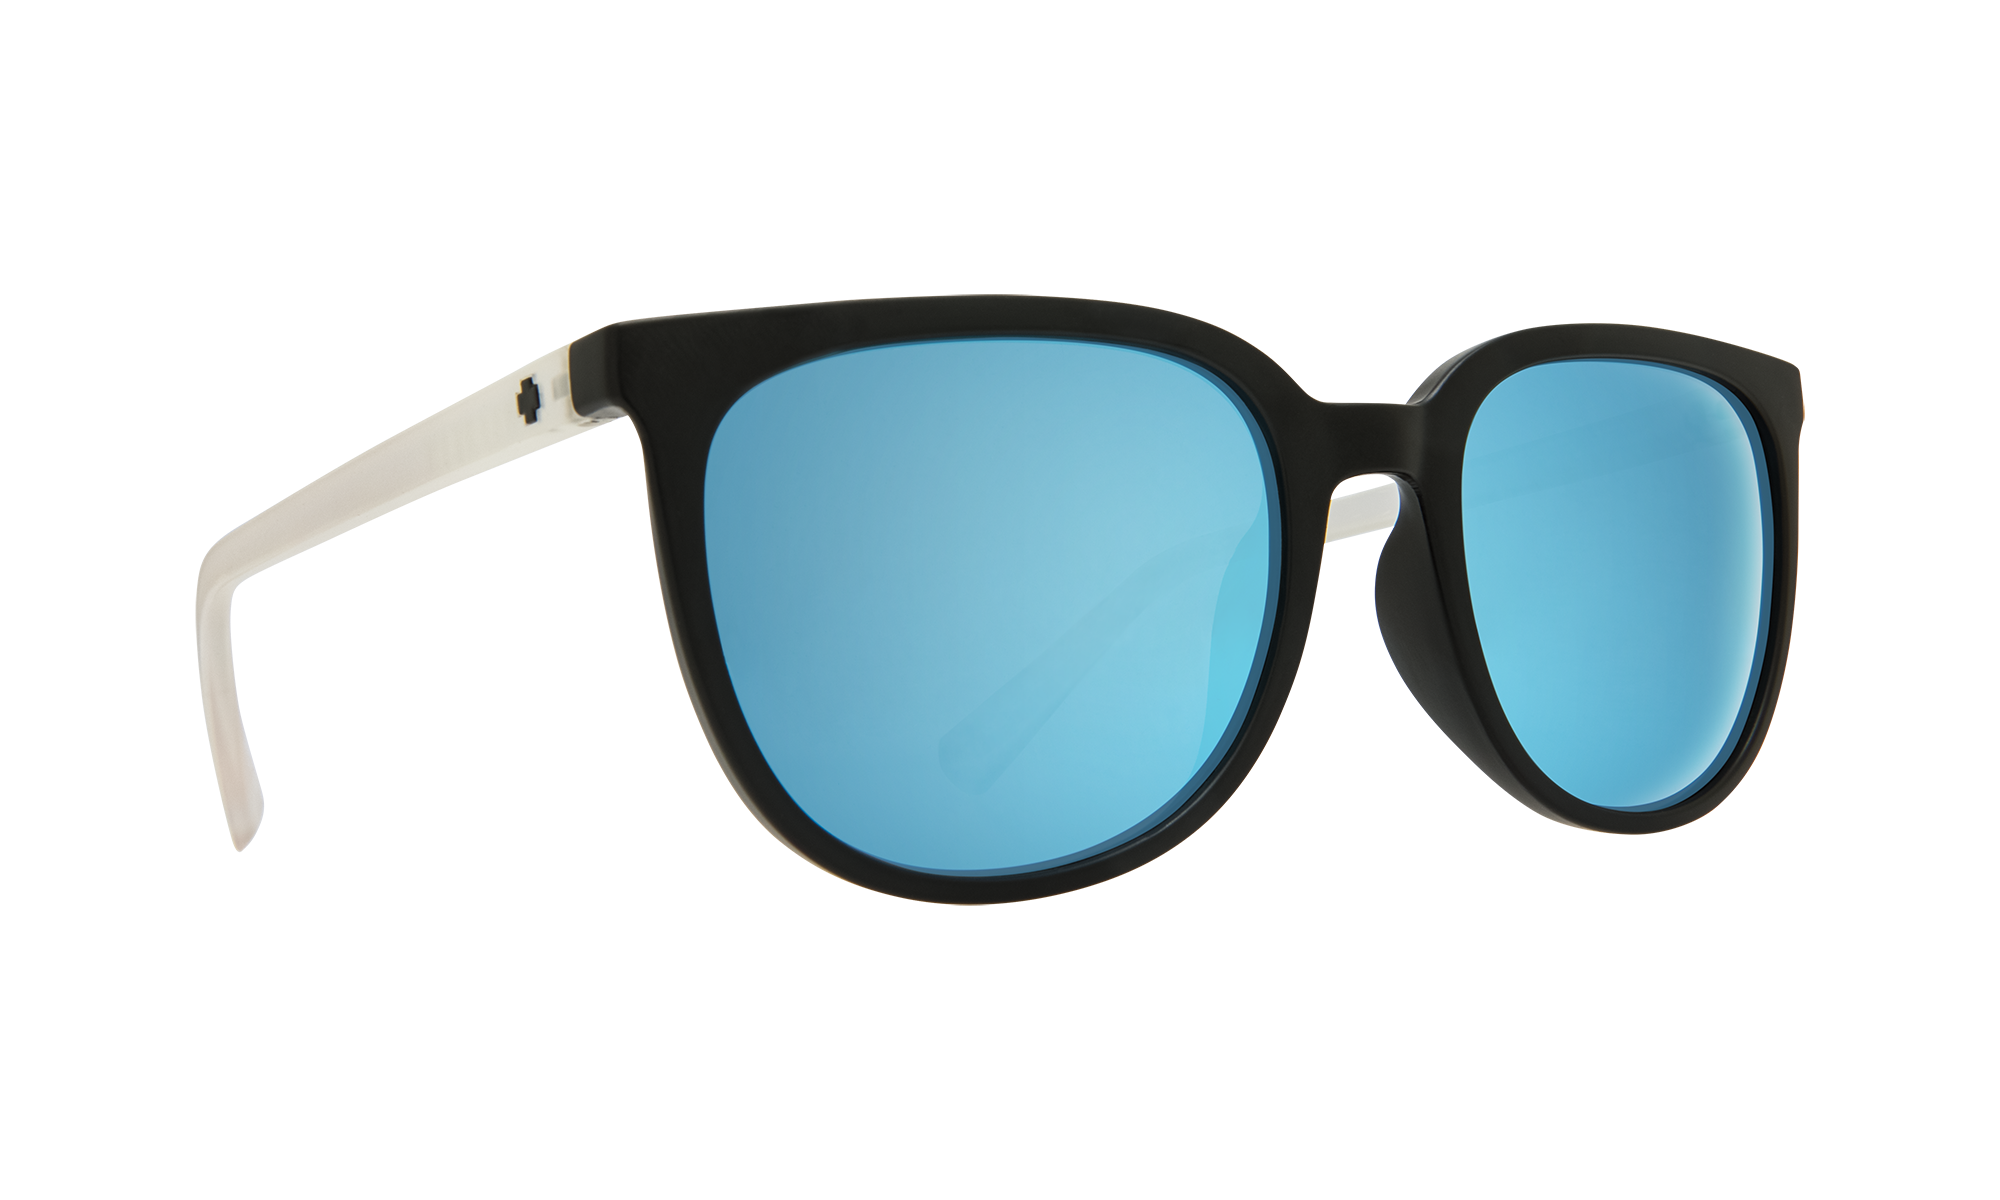 d4217f4c53 Spy Optic Fizz Progressive Prescription Sunglasses FREE S H 673514080963PR